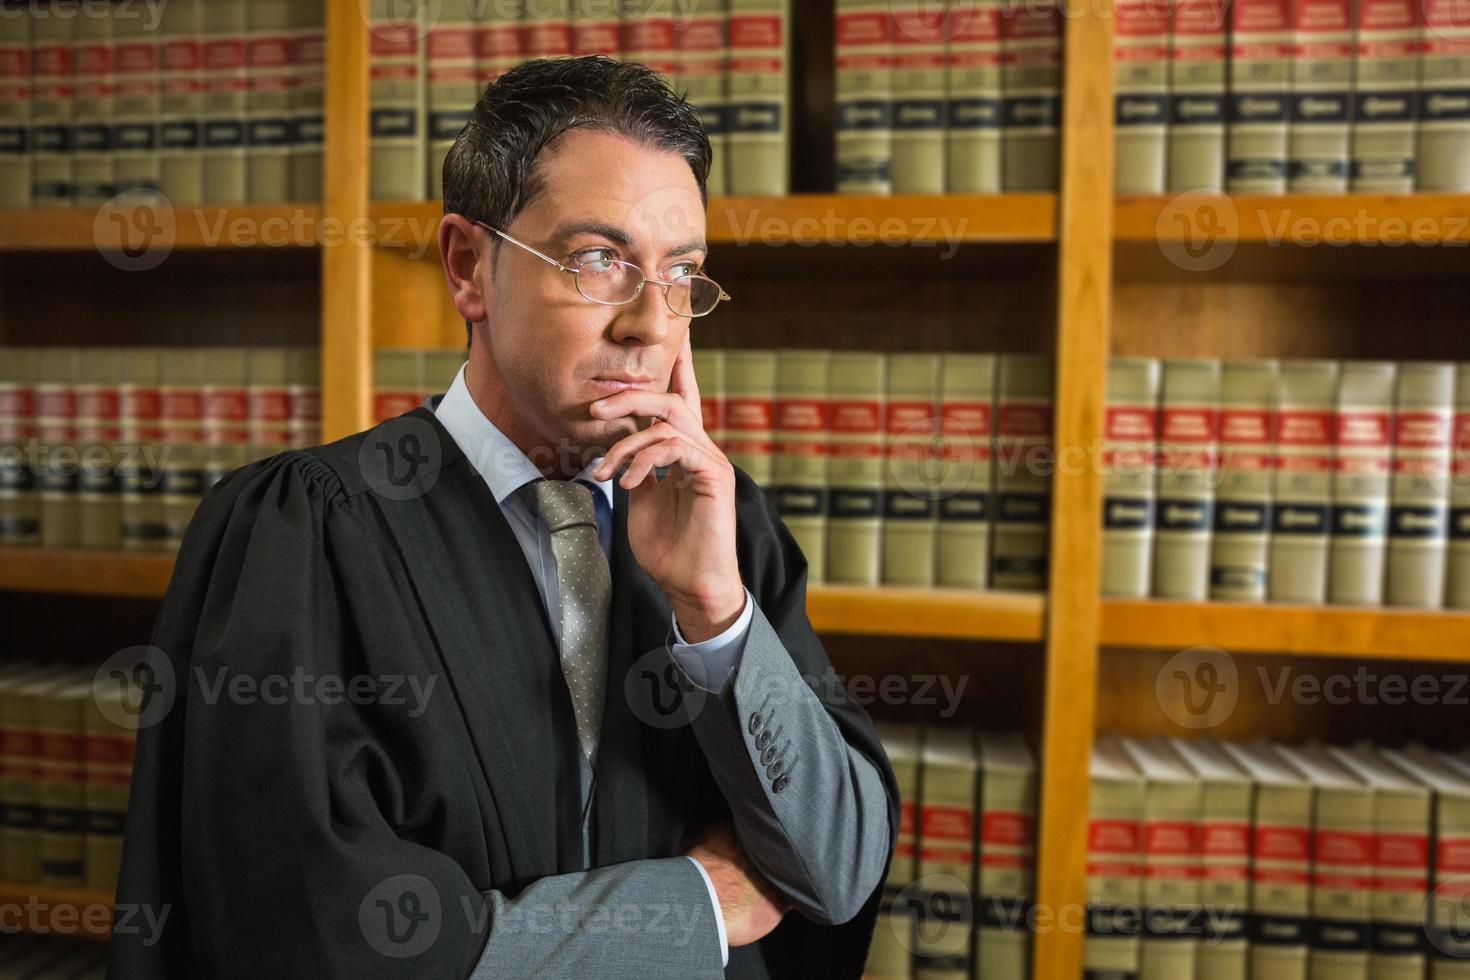 Anwalt denkt in der Rechtsbibliothek foto